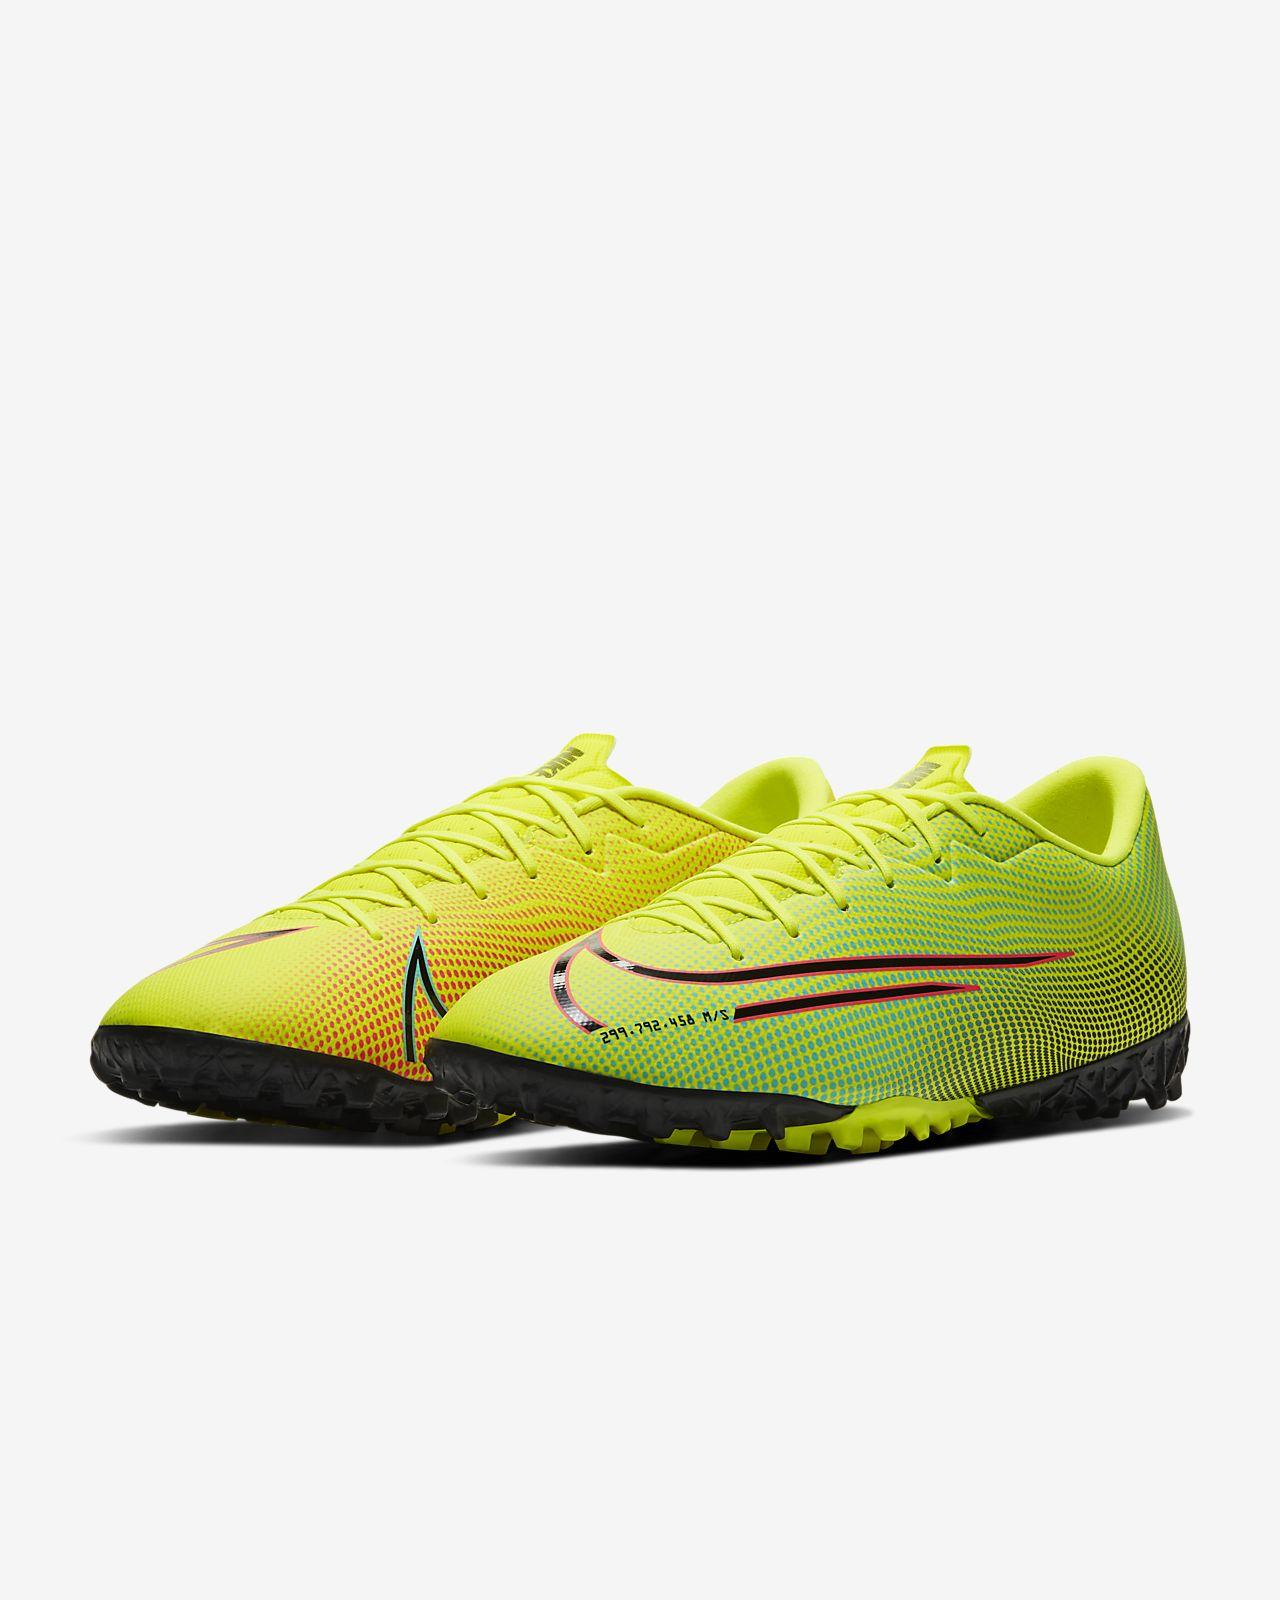 Nike Mercurial Vapor 13 Academy MDS TF fotballsko til grusturf